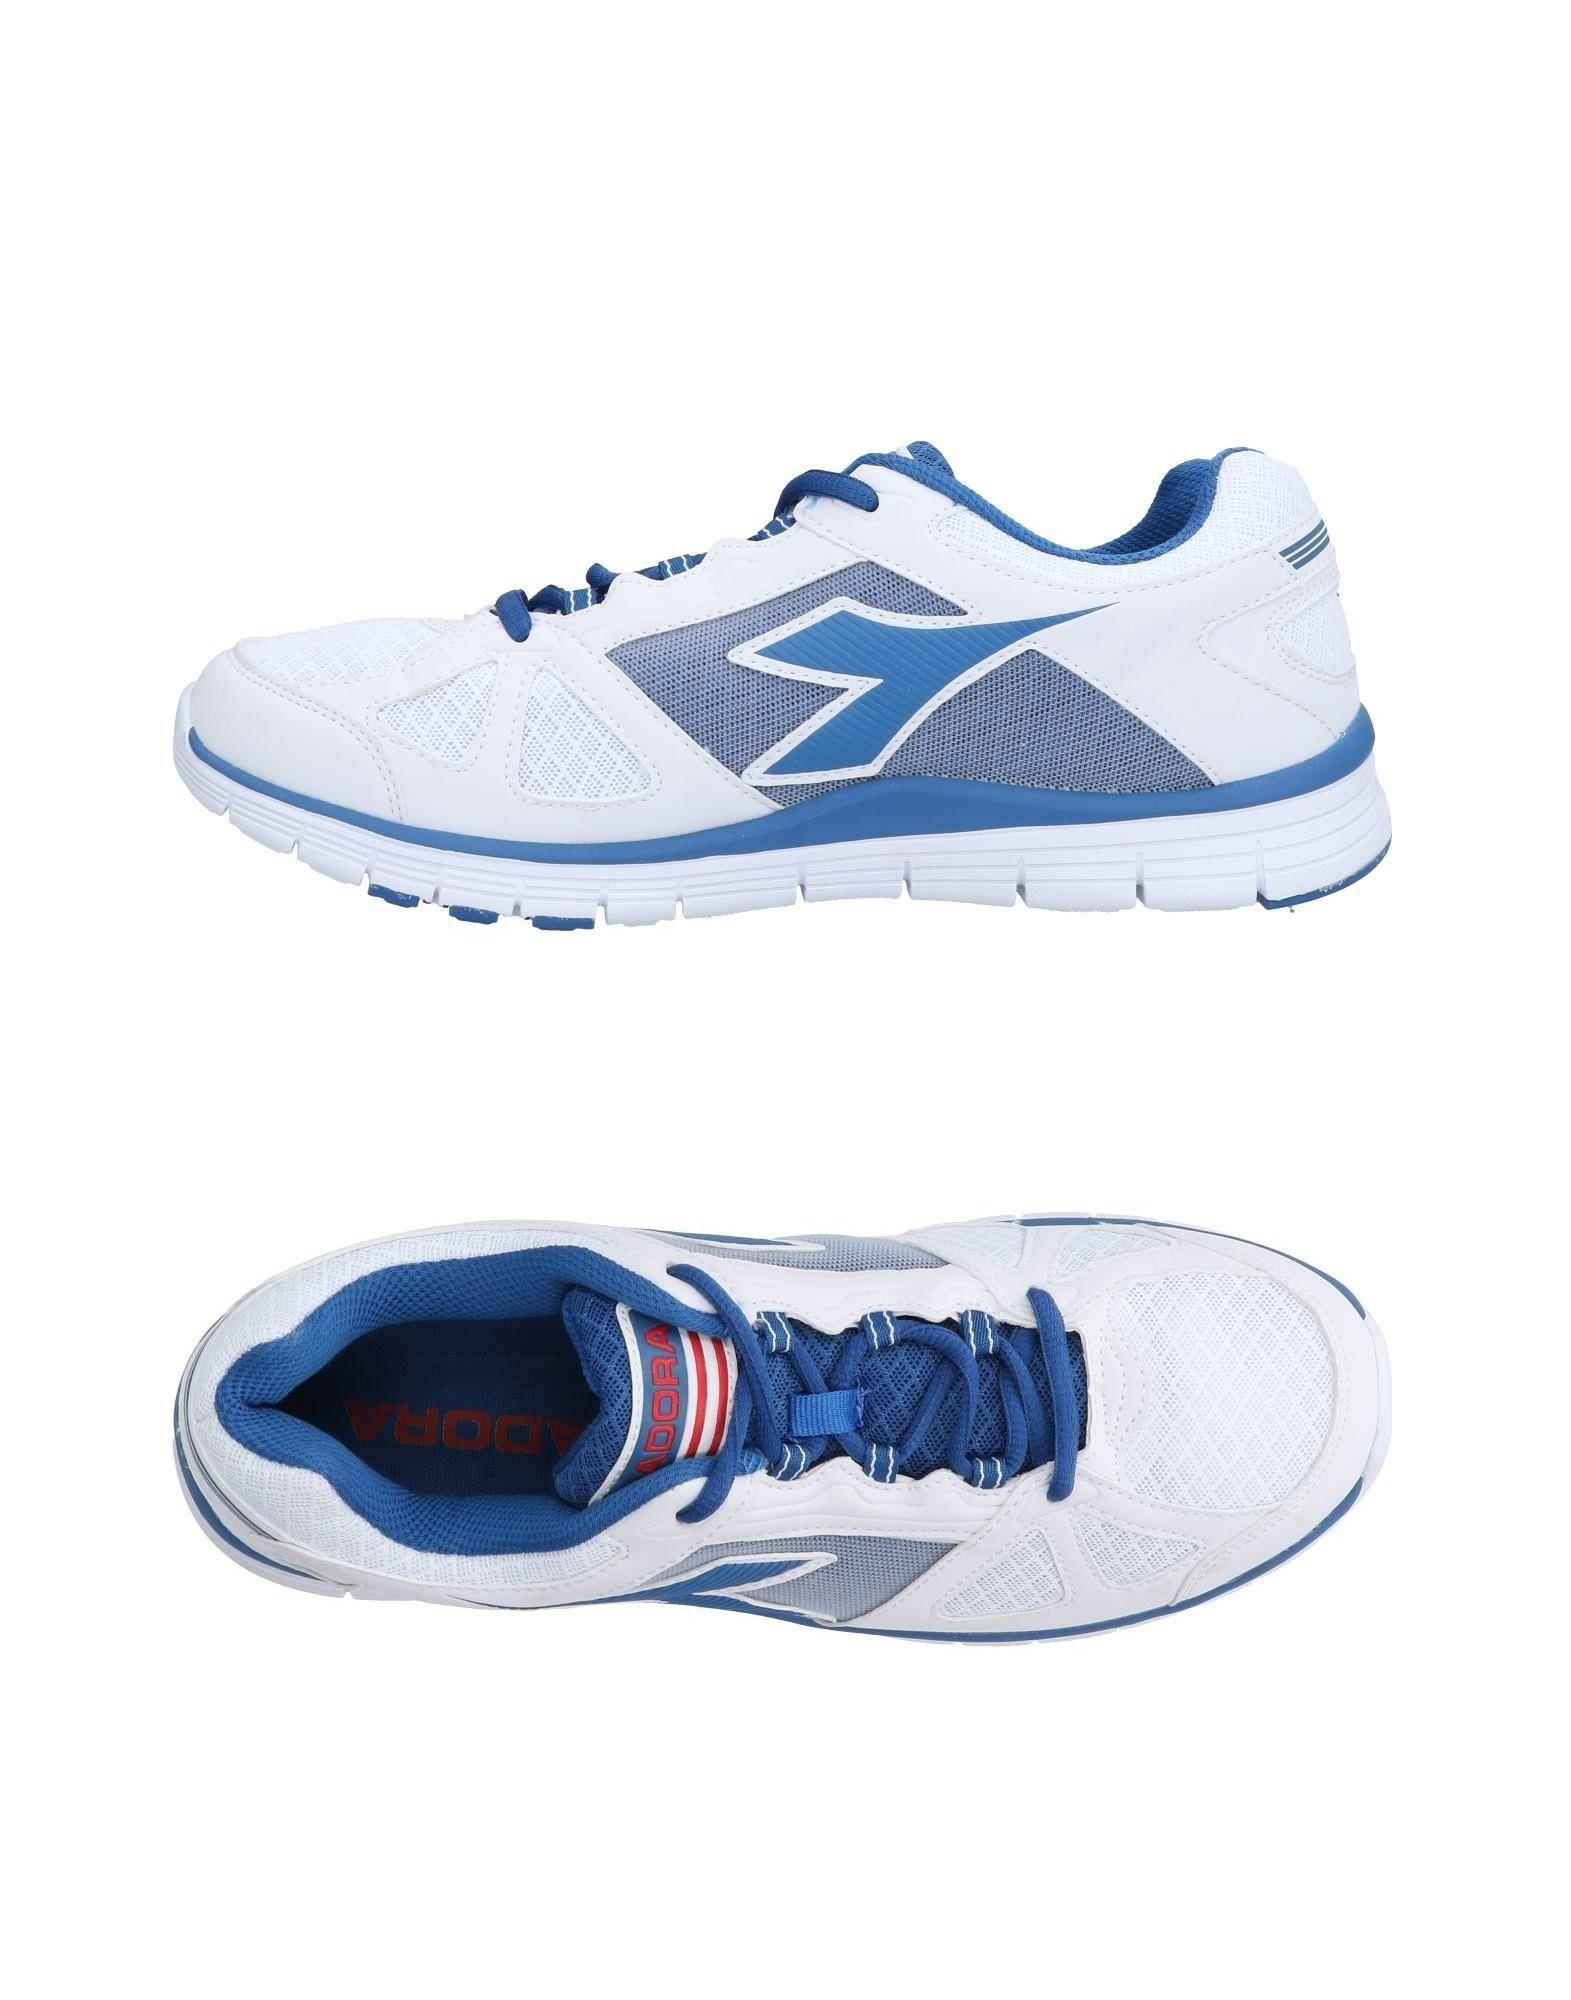 the best attitude a5abf f8d29 DIADORA ΠΑΠΟΥΤΣΙΑ Παπούτσια τένις χαμηλά, Ανδρικά παπούτσια τέννις ...